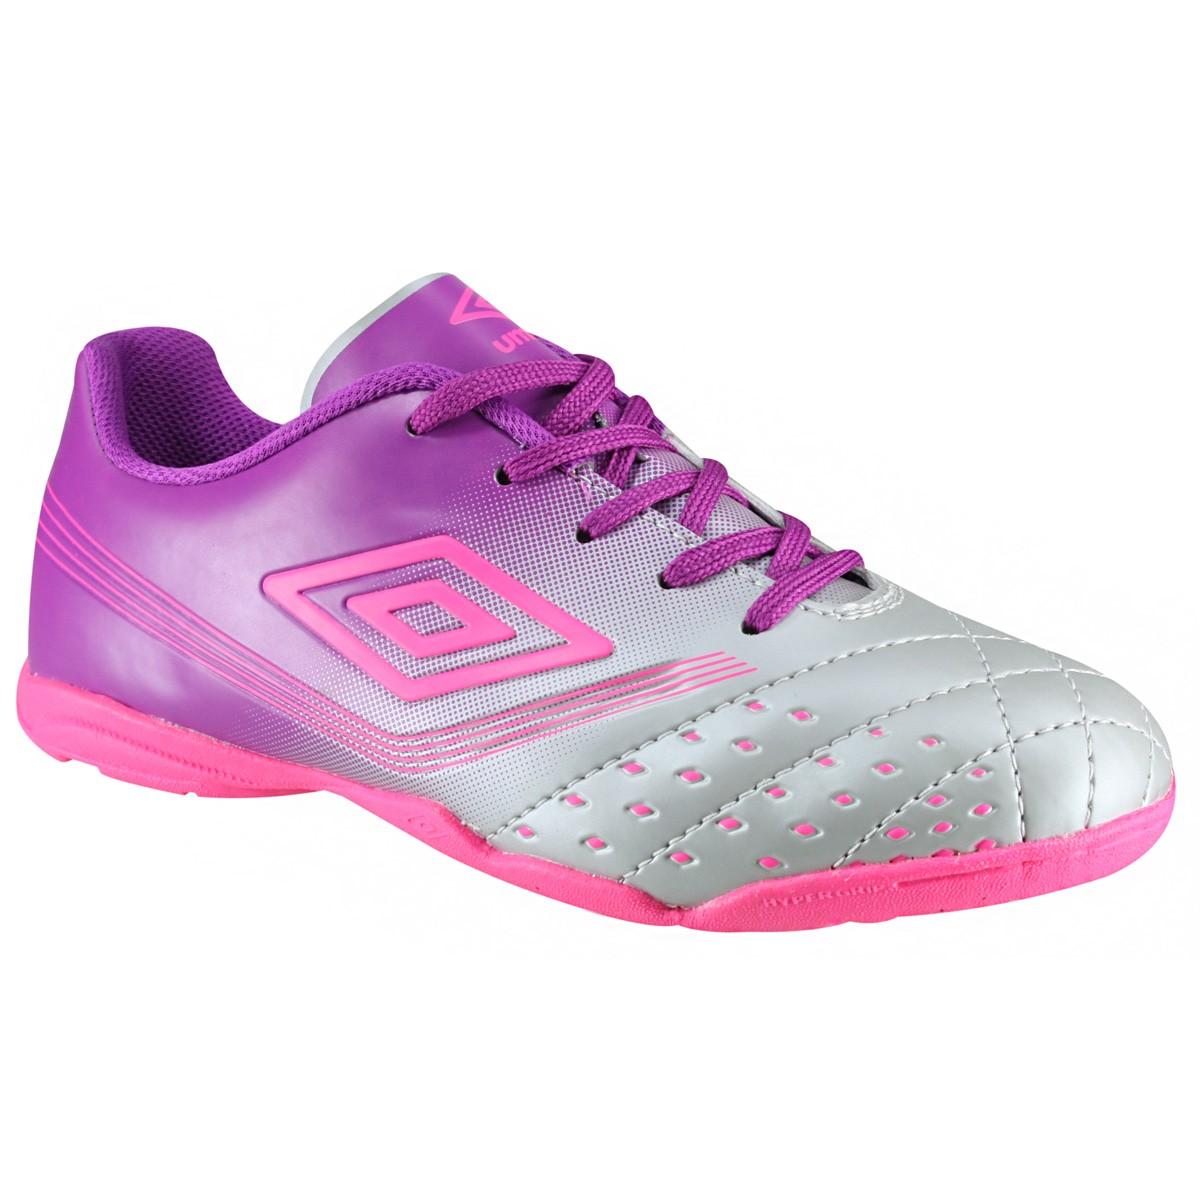 Indoor Feminino Fifty Umbro OF72063-000 Cinza Roxo Pink b621defd61a3b